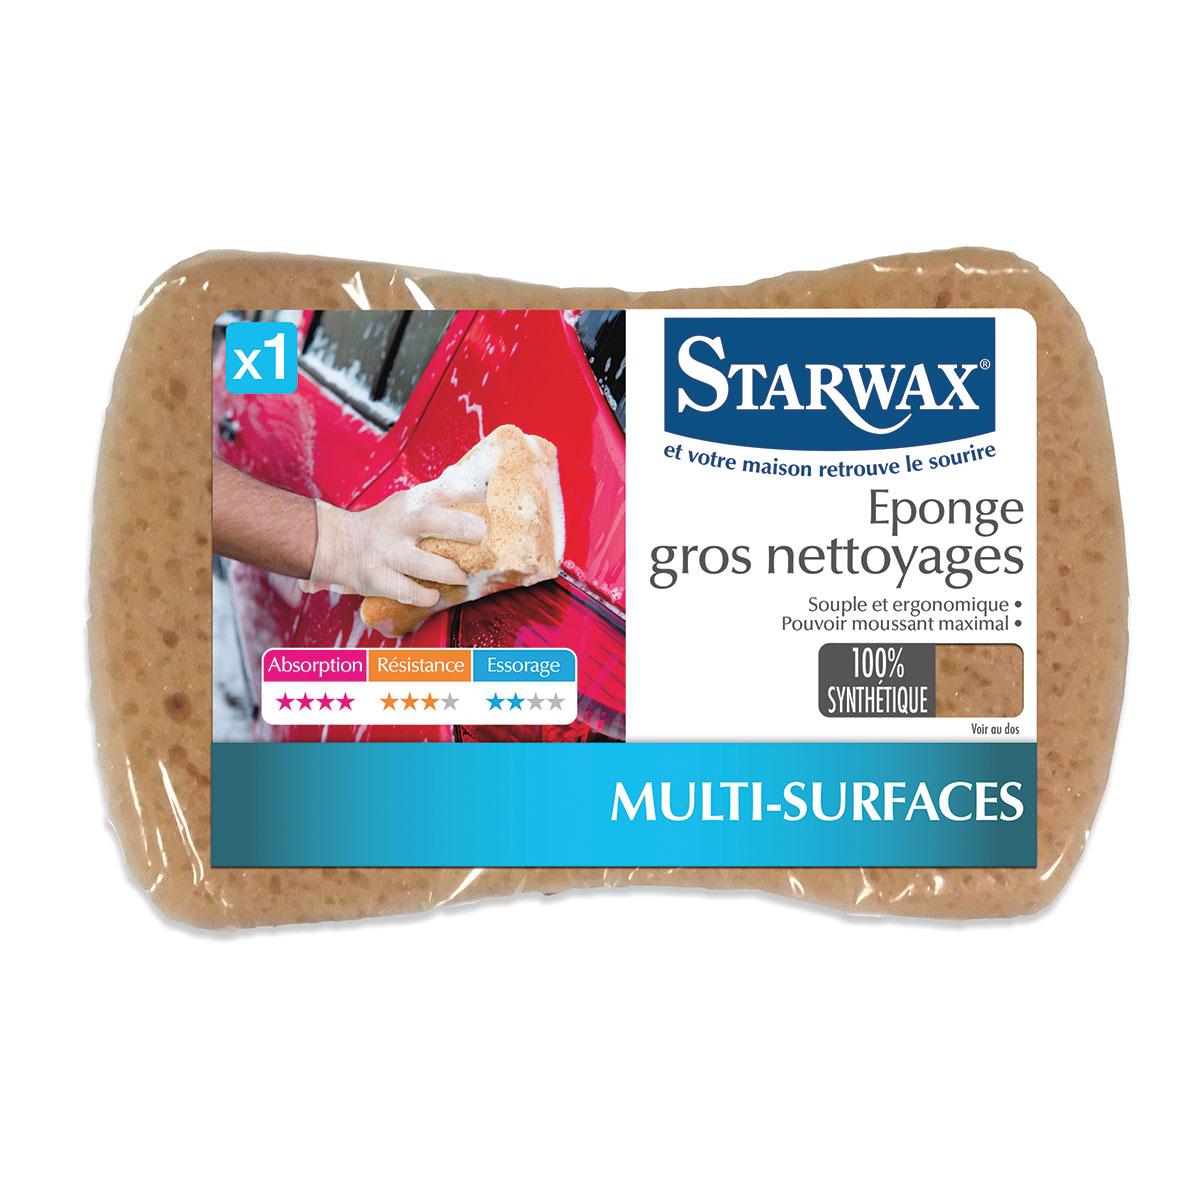 Éponges gros nettoyages - Starwax